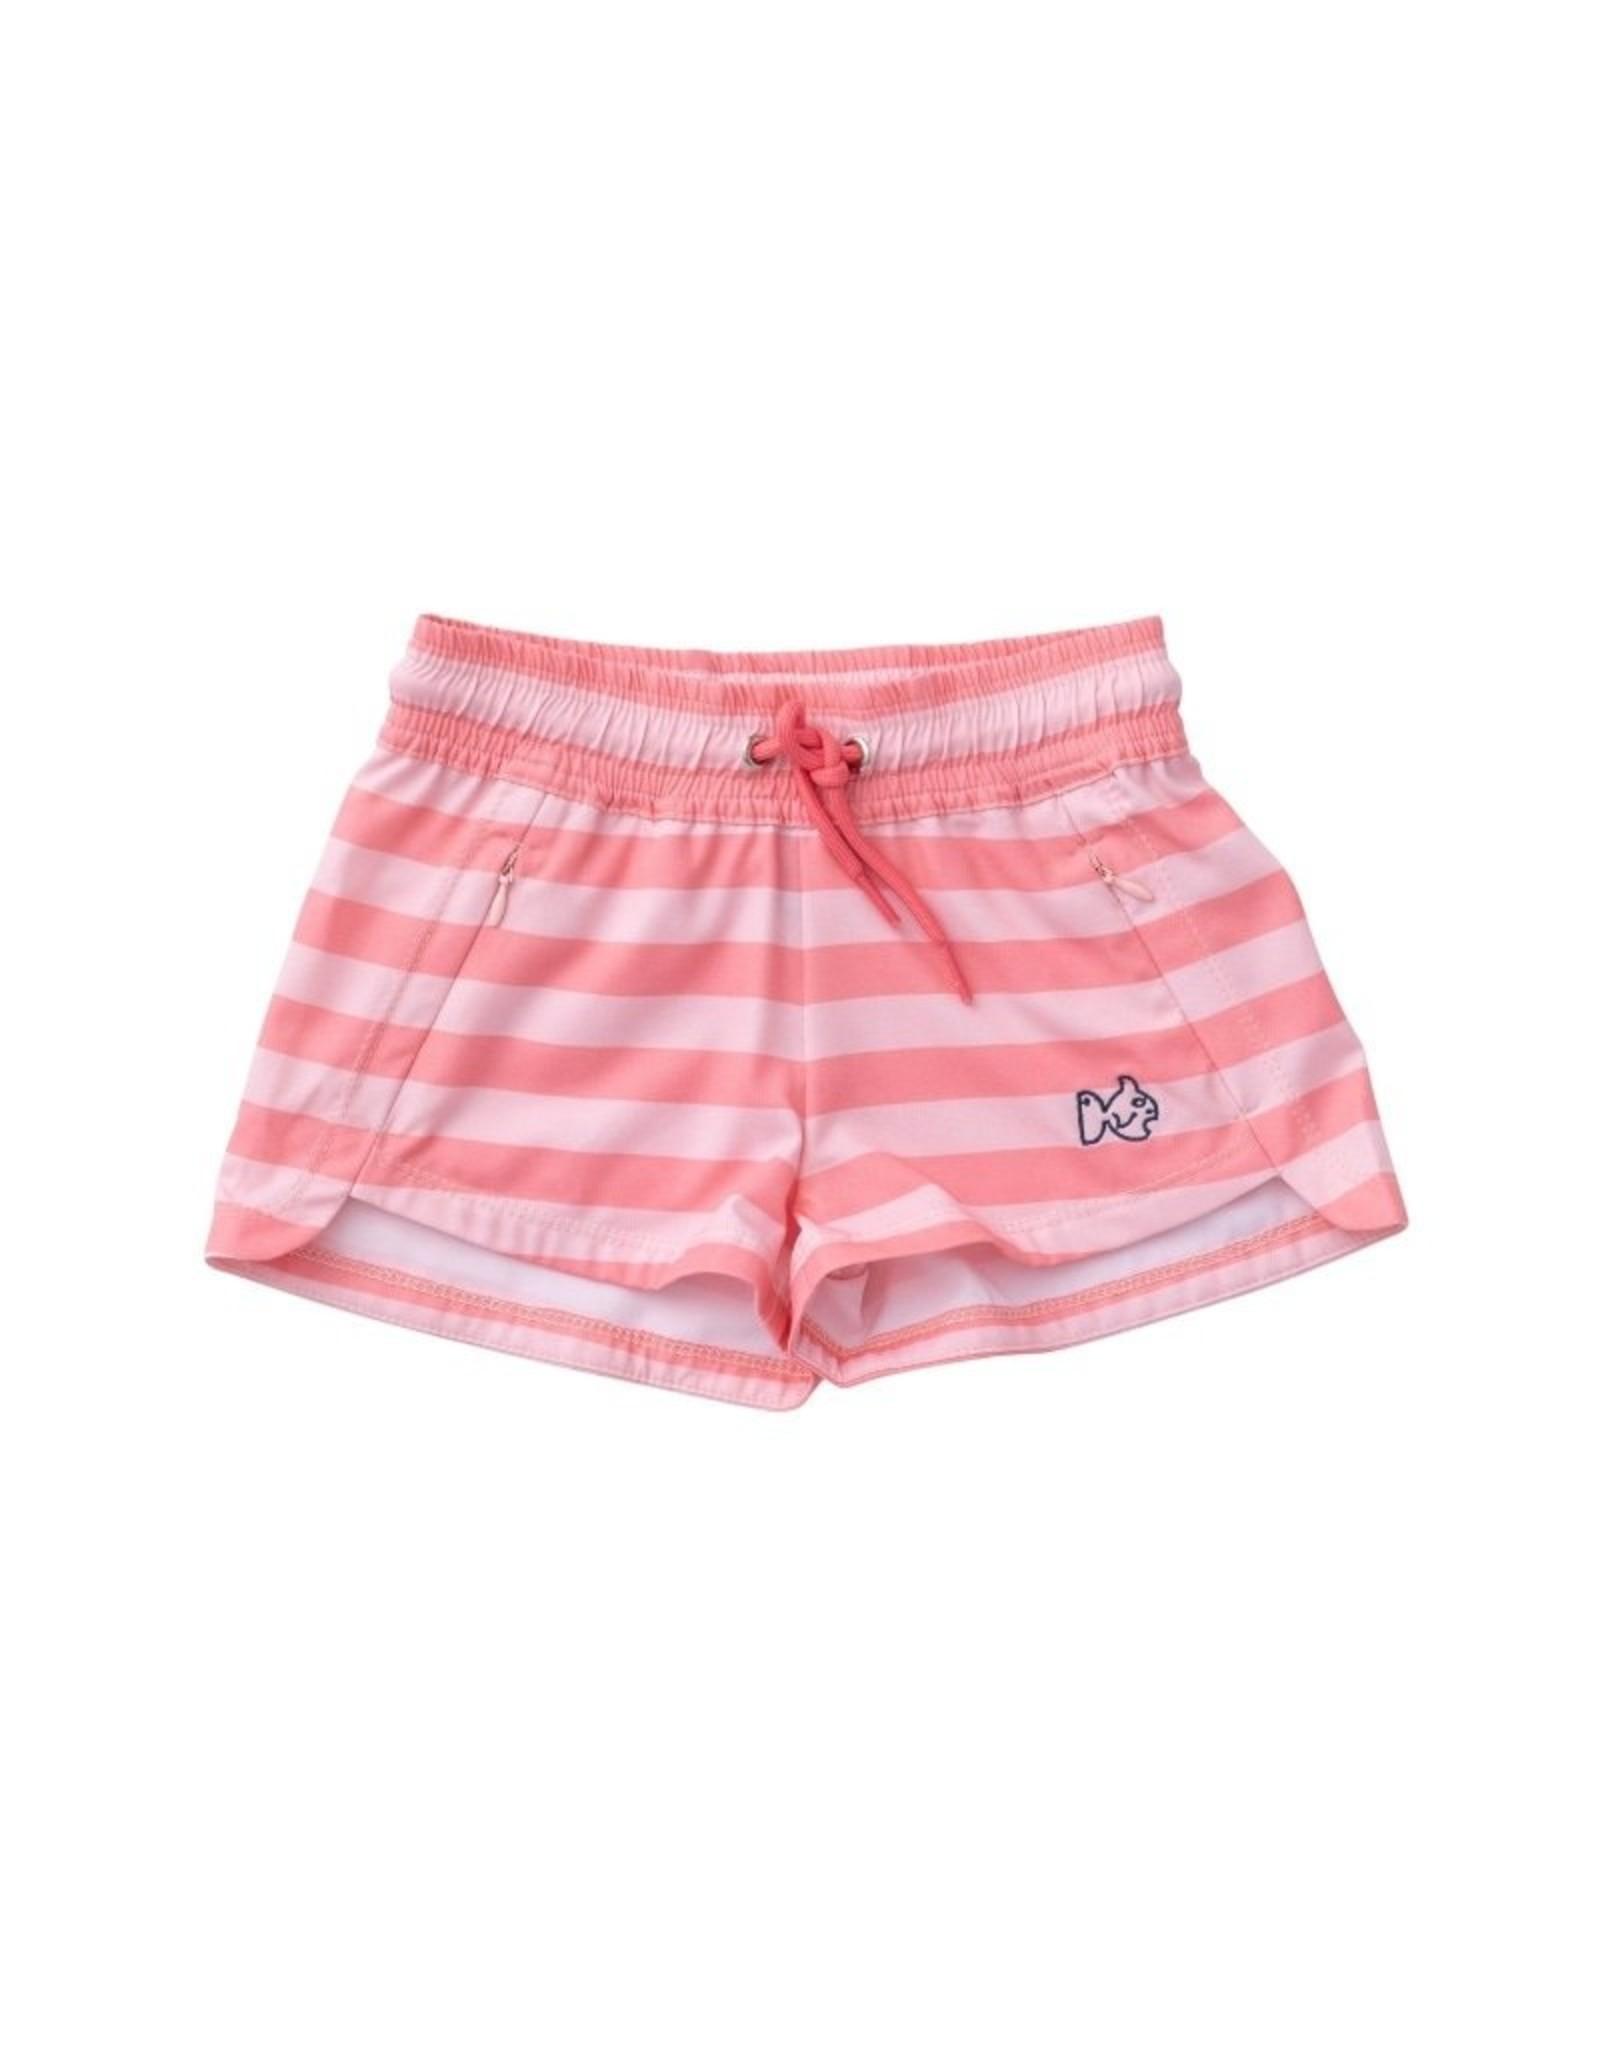 Prodoh Flamingo Pink Girl's Beach Cruiser Short